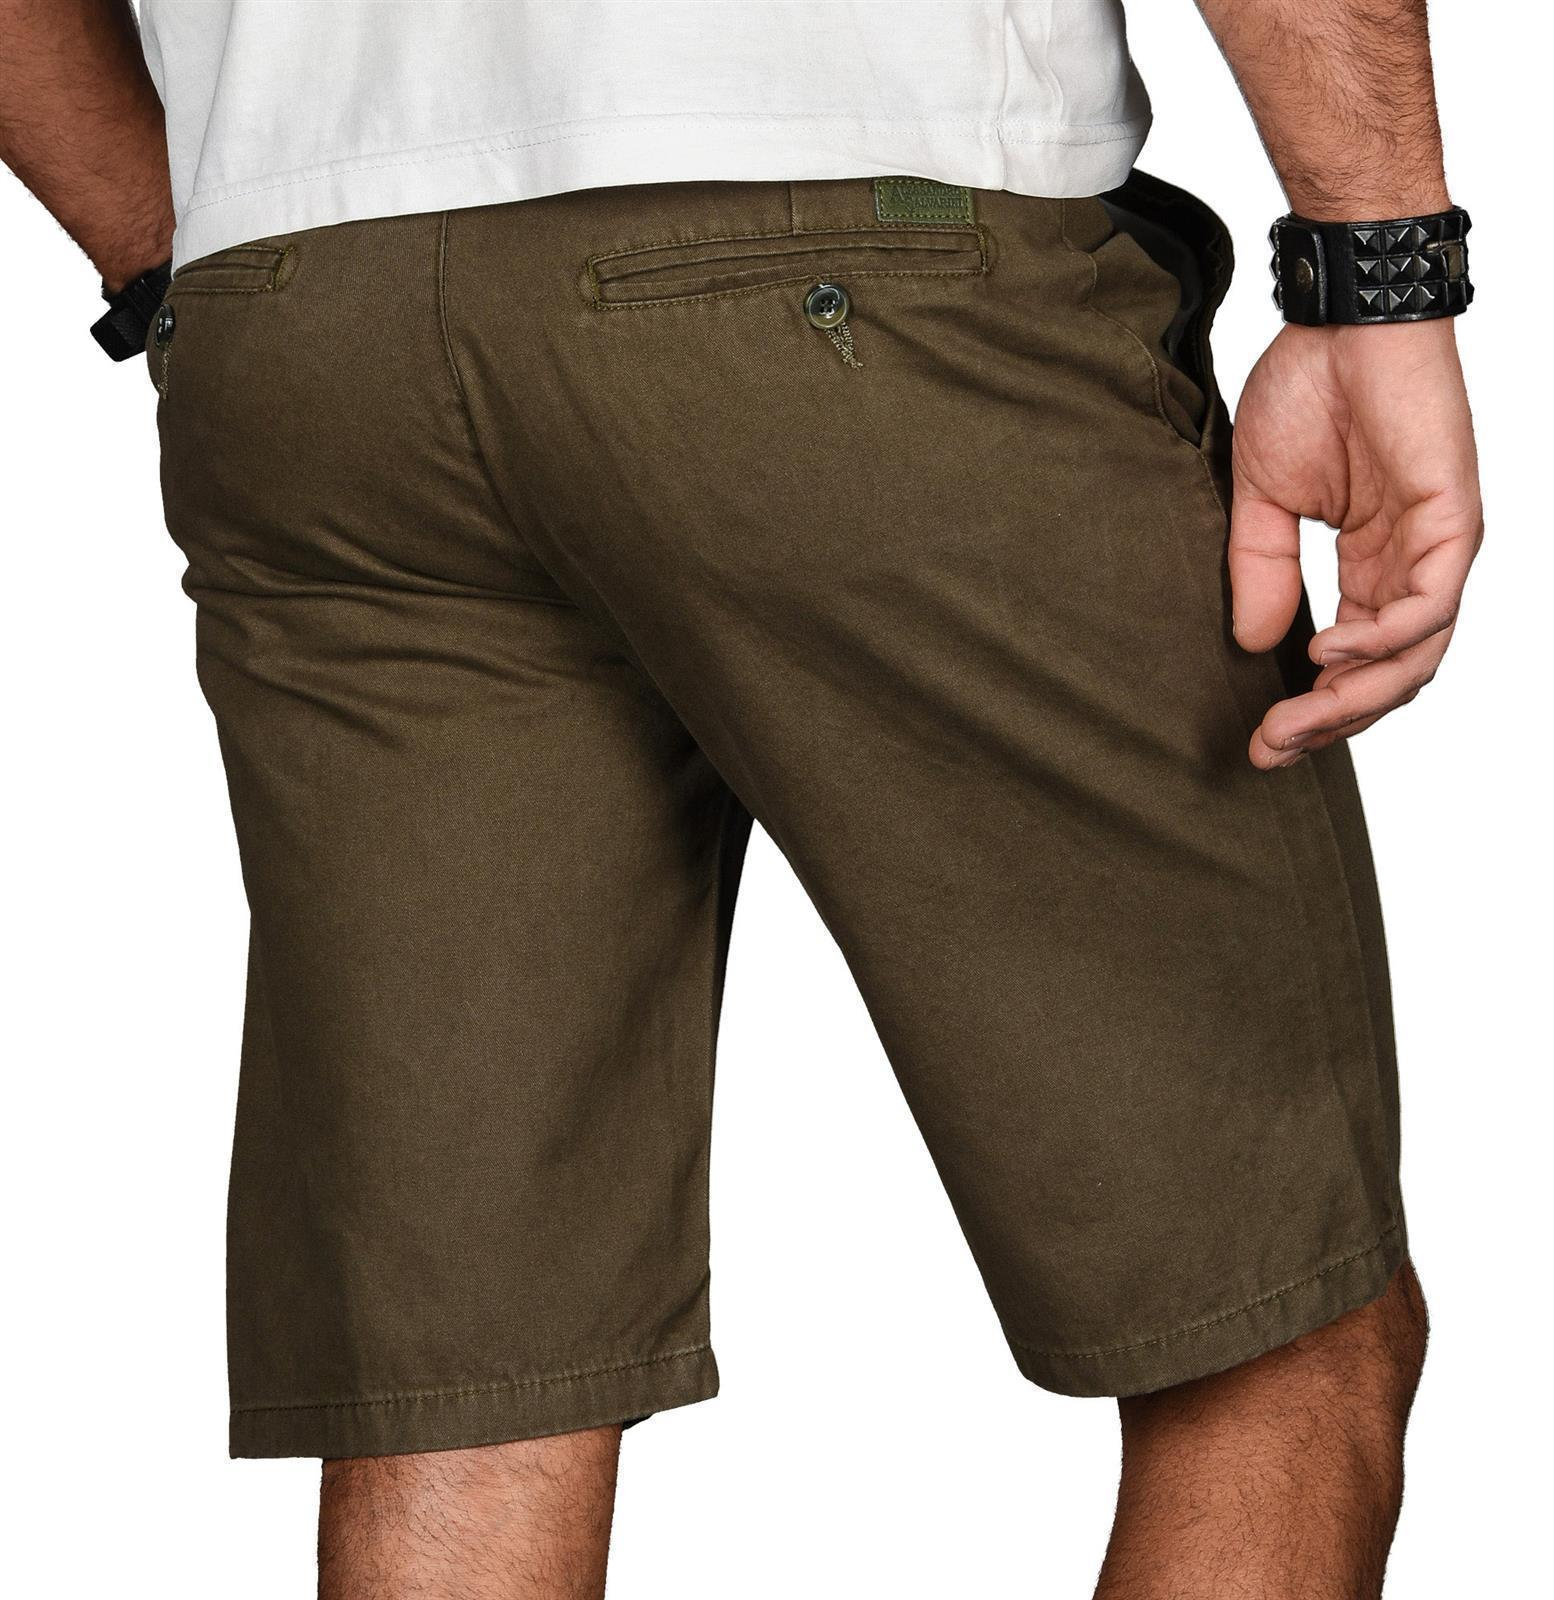 A-Salvarini-Herren-Shorts-kurze-Sommer-Hose-mit-Guertel-Short-Bermuda-NEU-AS096 Indexbild 38